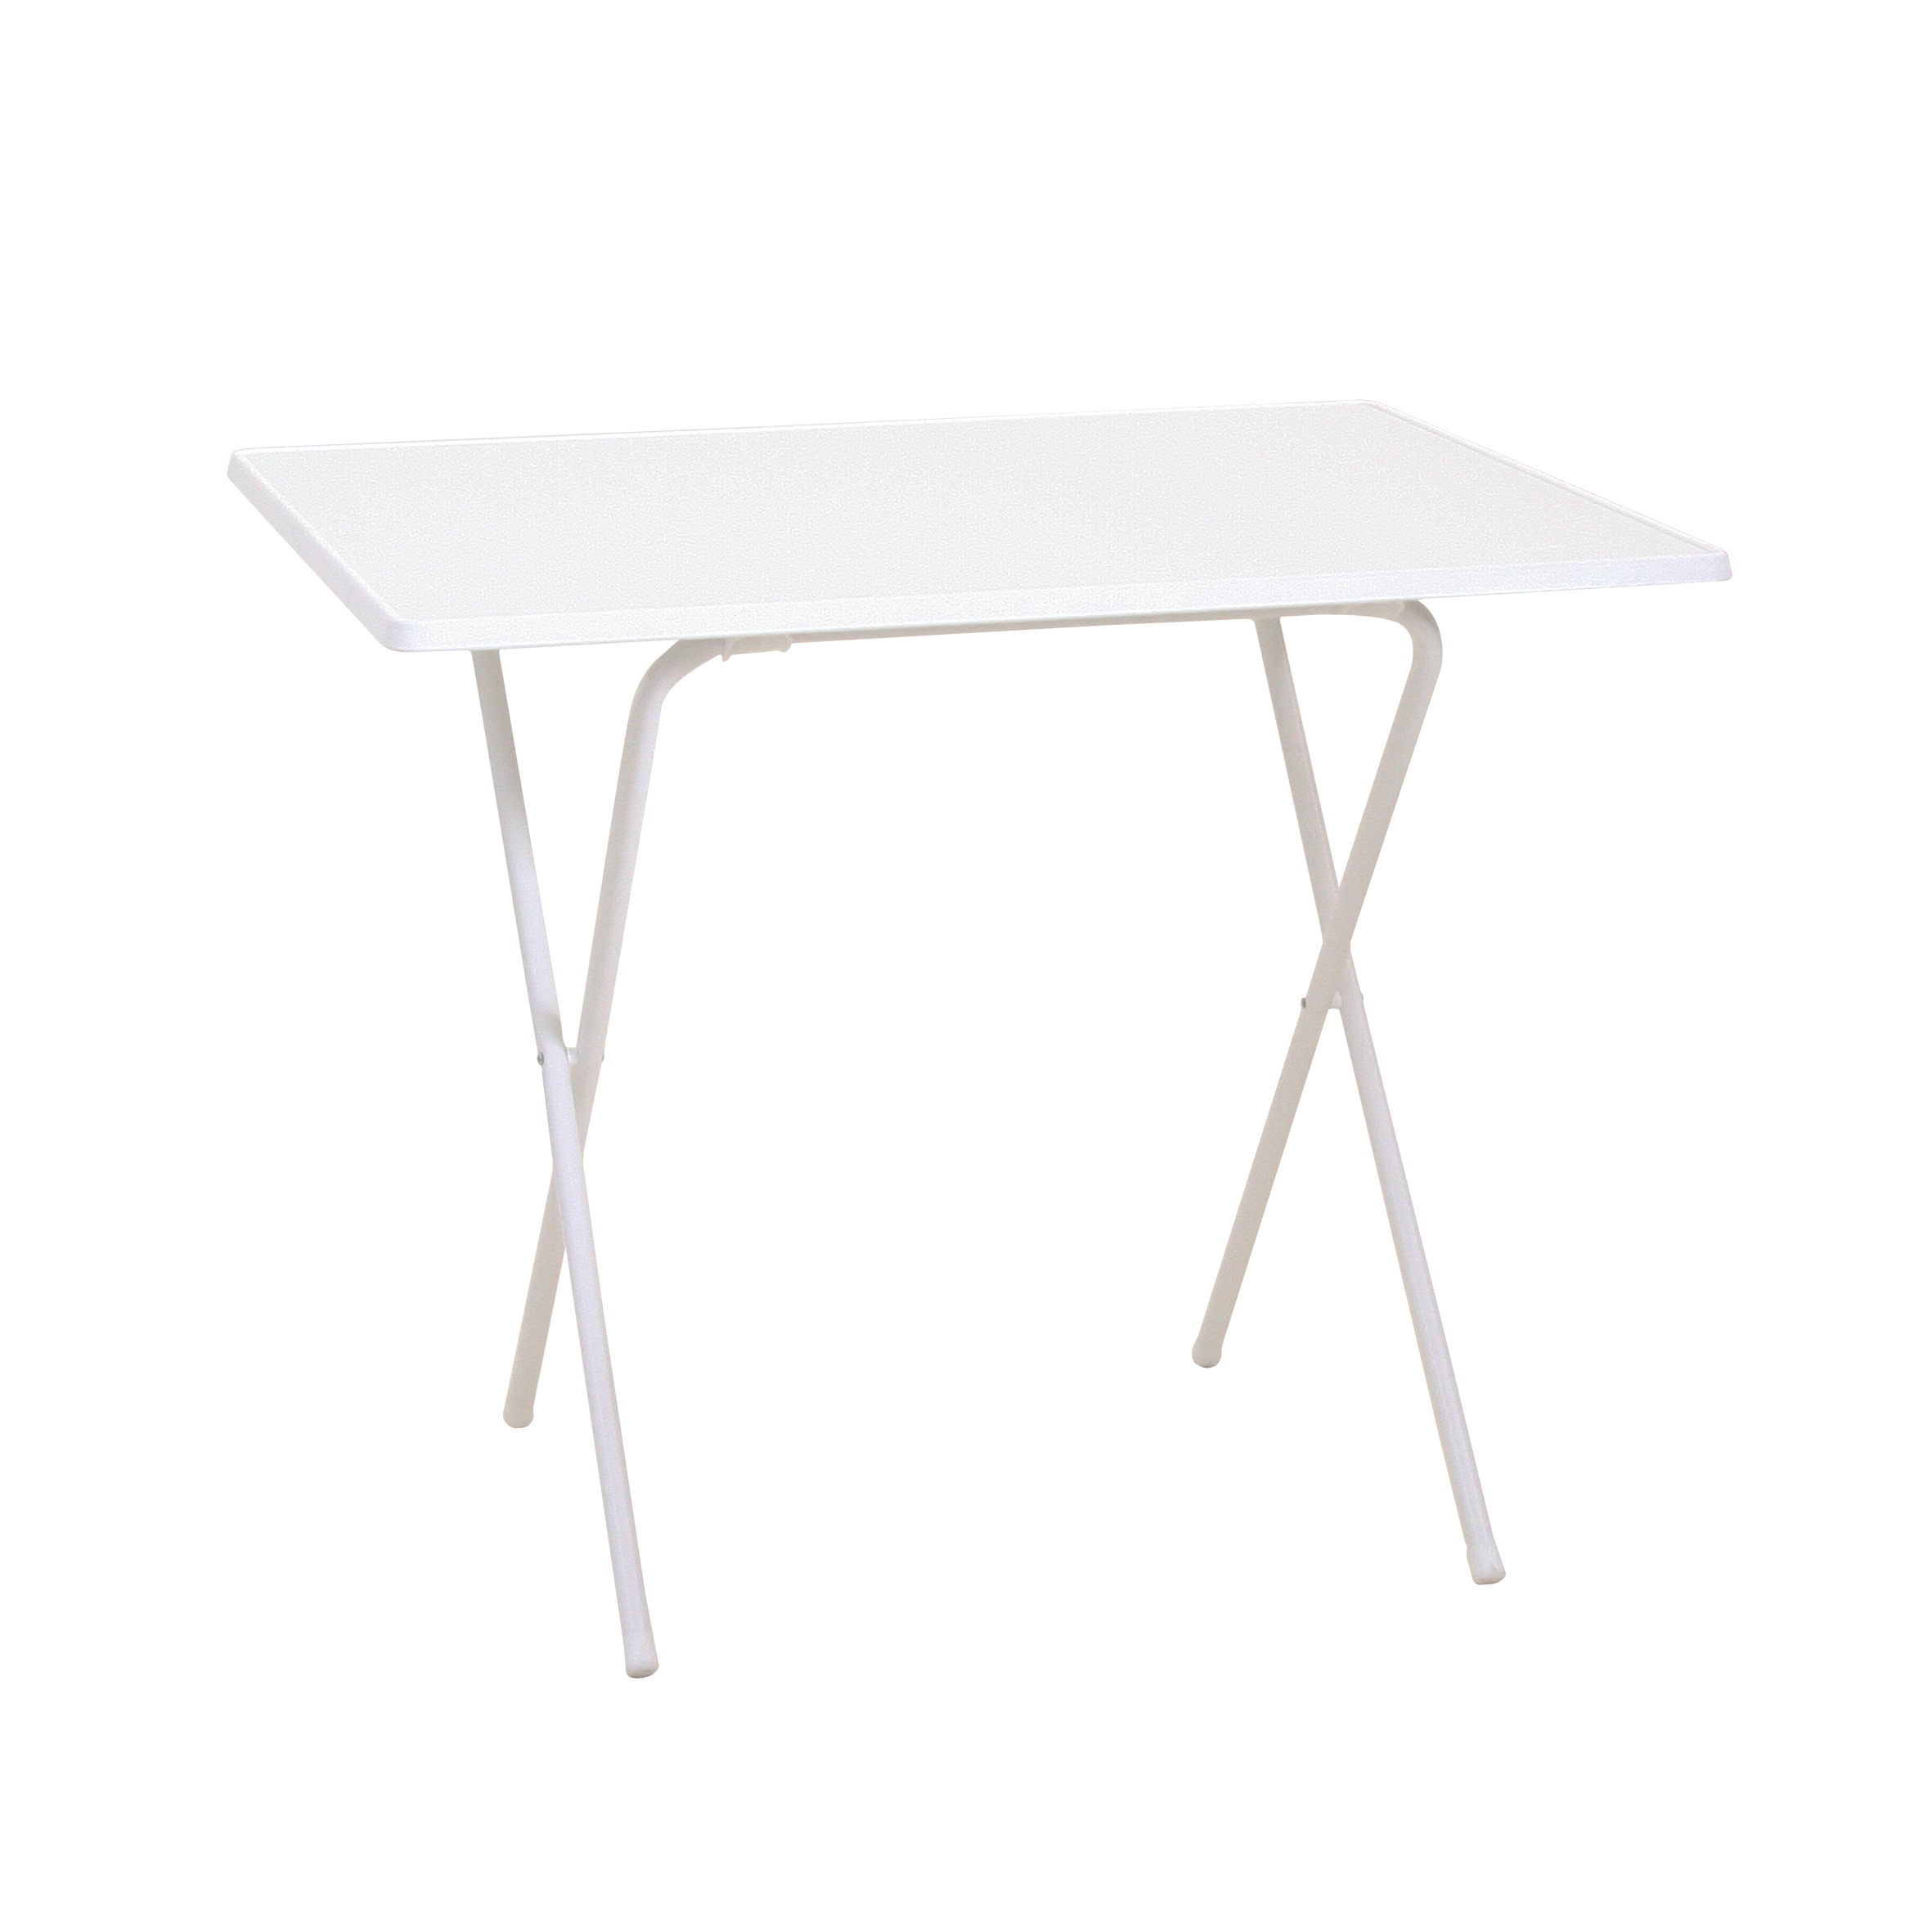 klapp scheren tisch scherentisch camping campingtisch. Black Bedroom Furniture Sets. Home Design Ideas